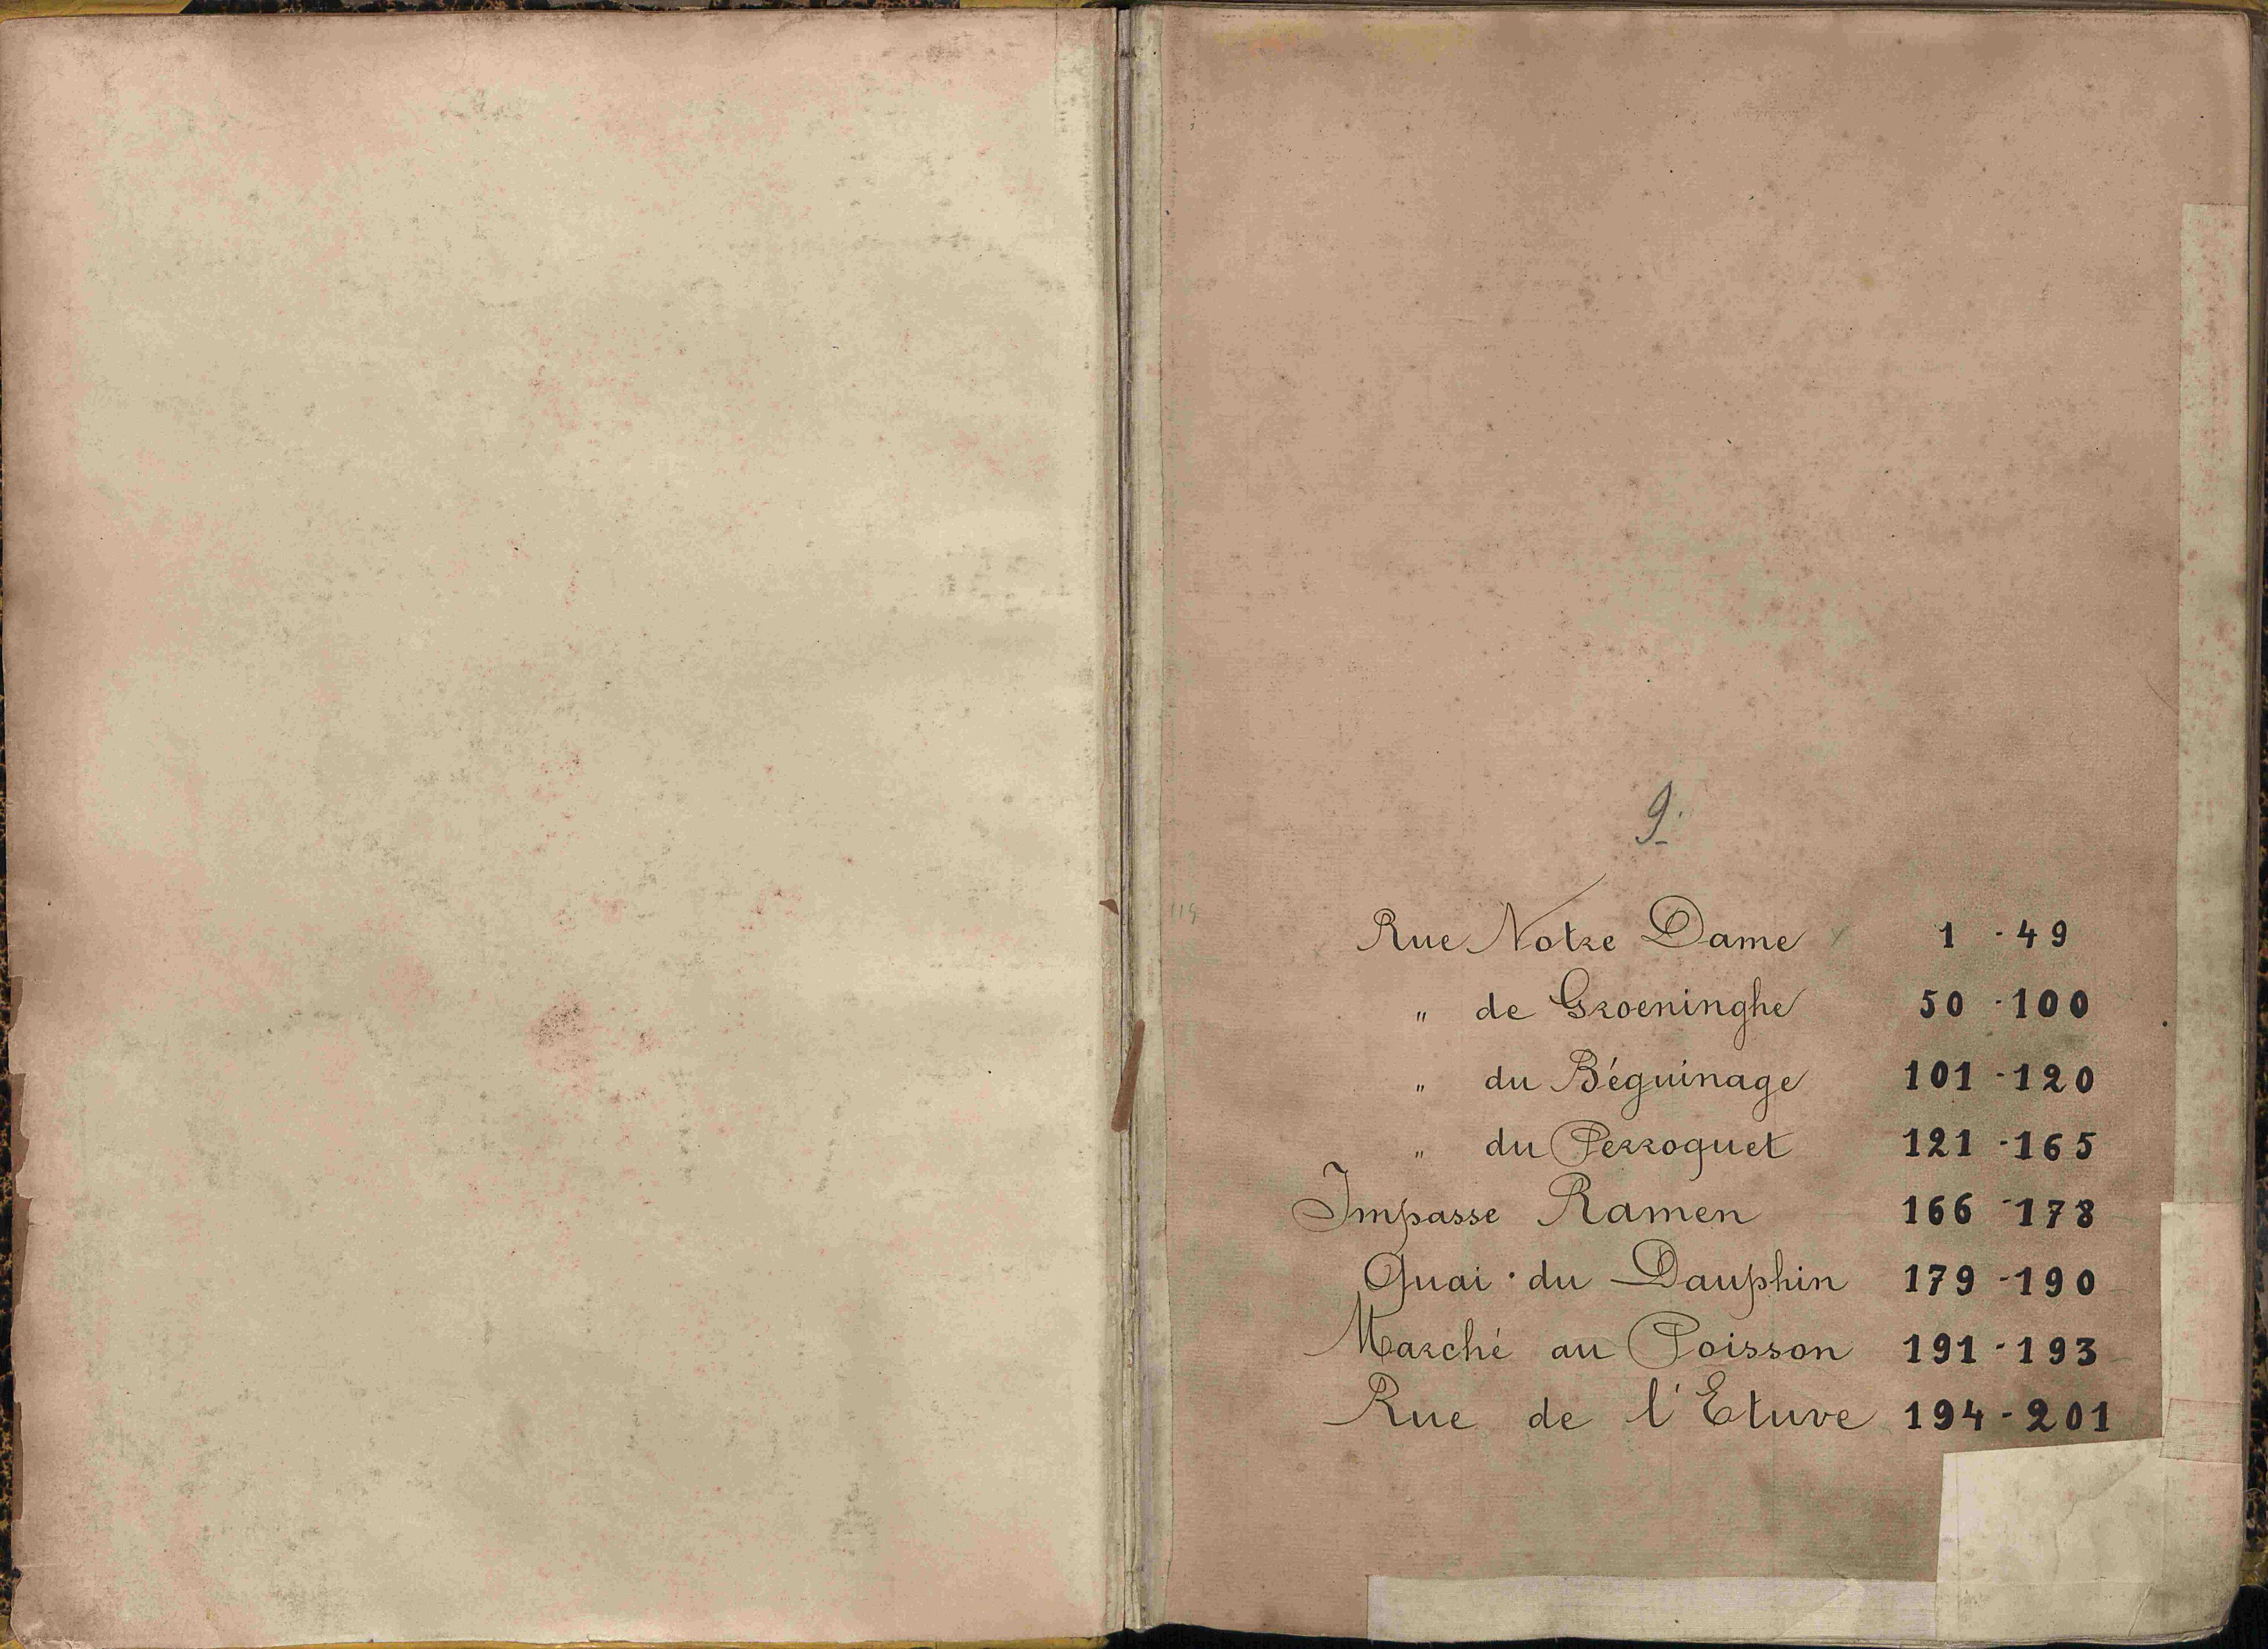 Bevolkingsregister Kortrijk 1890 boek 9